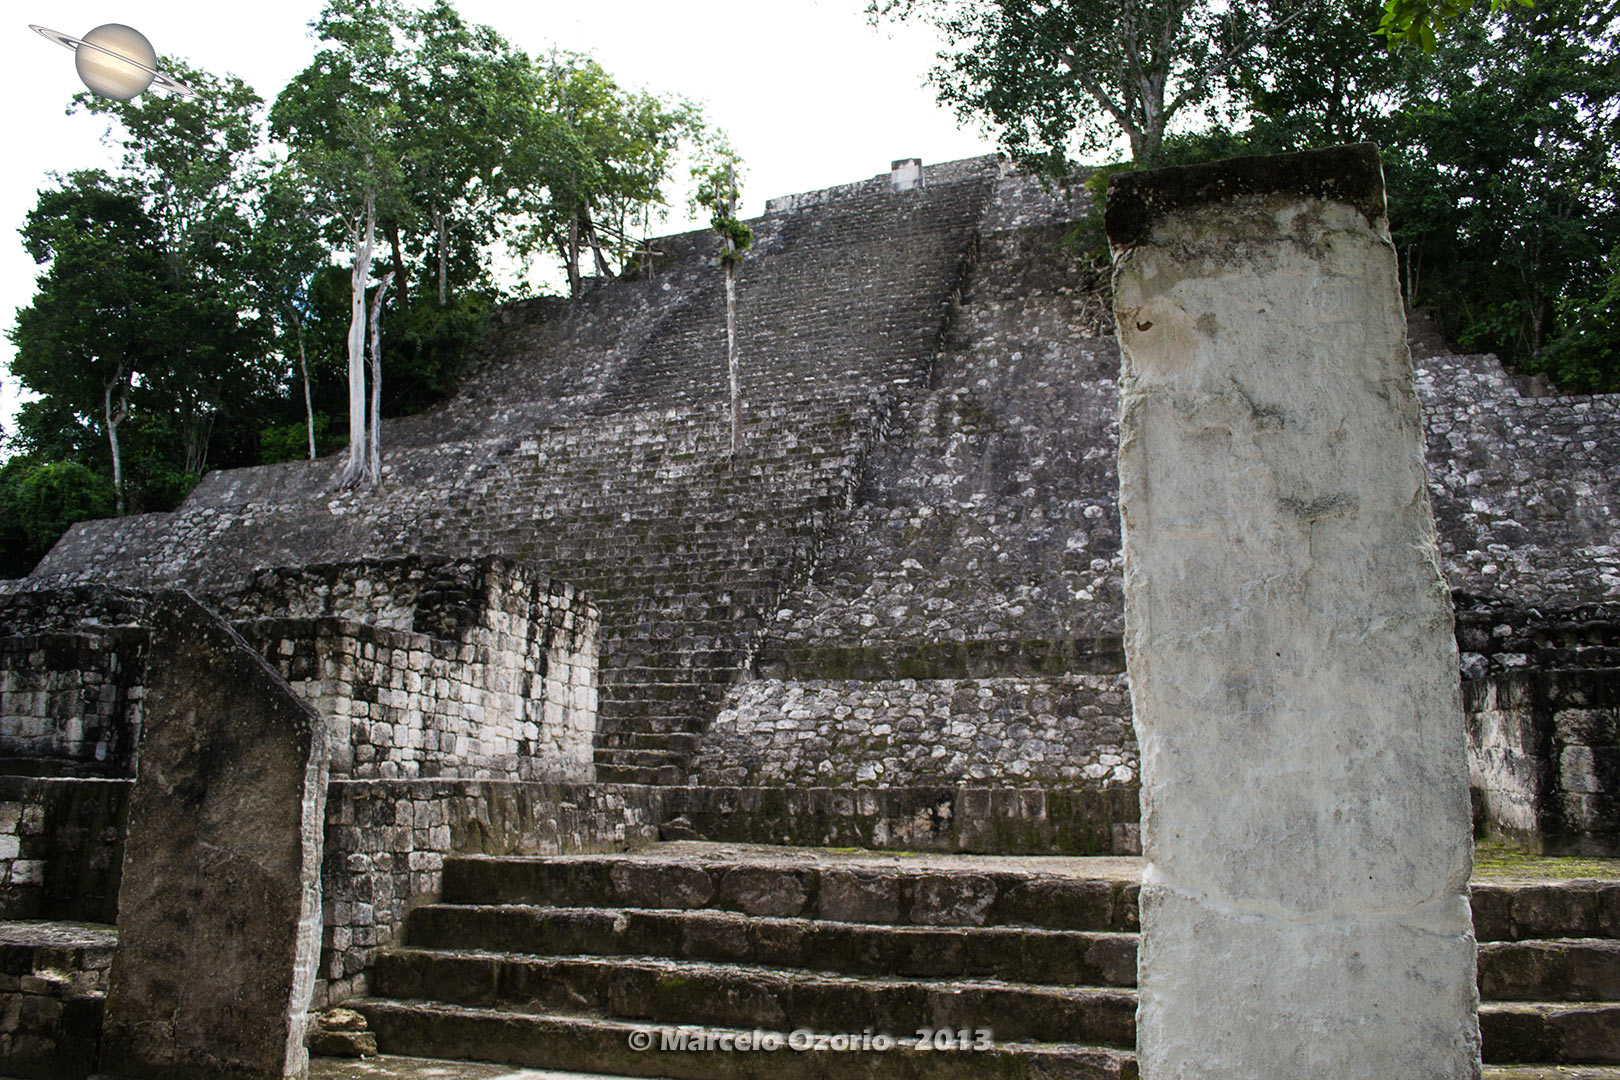 calakmul mayan civilization mexico 26 - Calakmul, City of the Two Adjacent Pyramids - Mexico